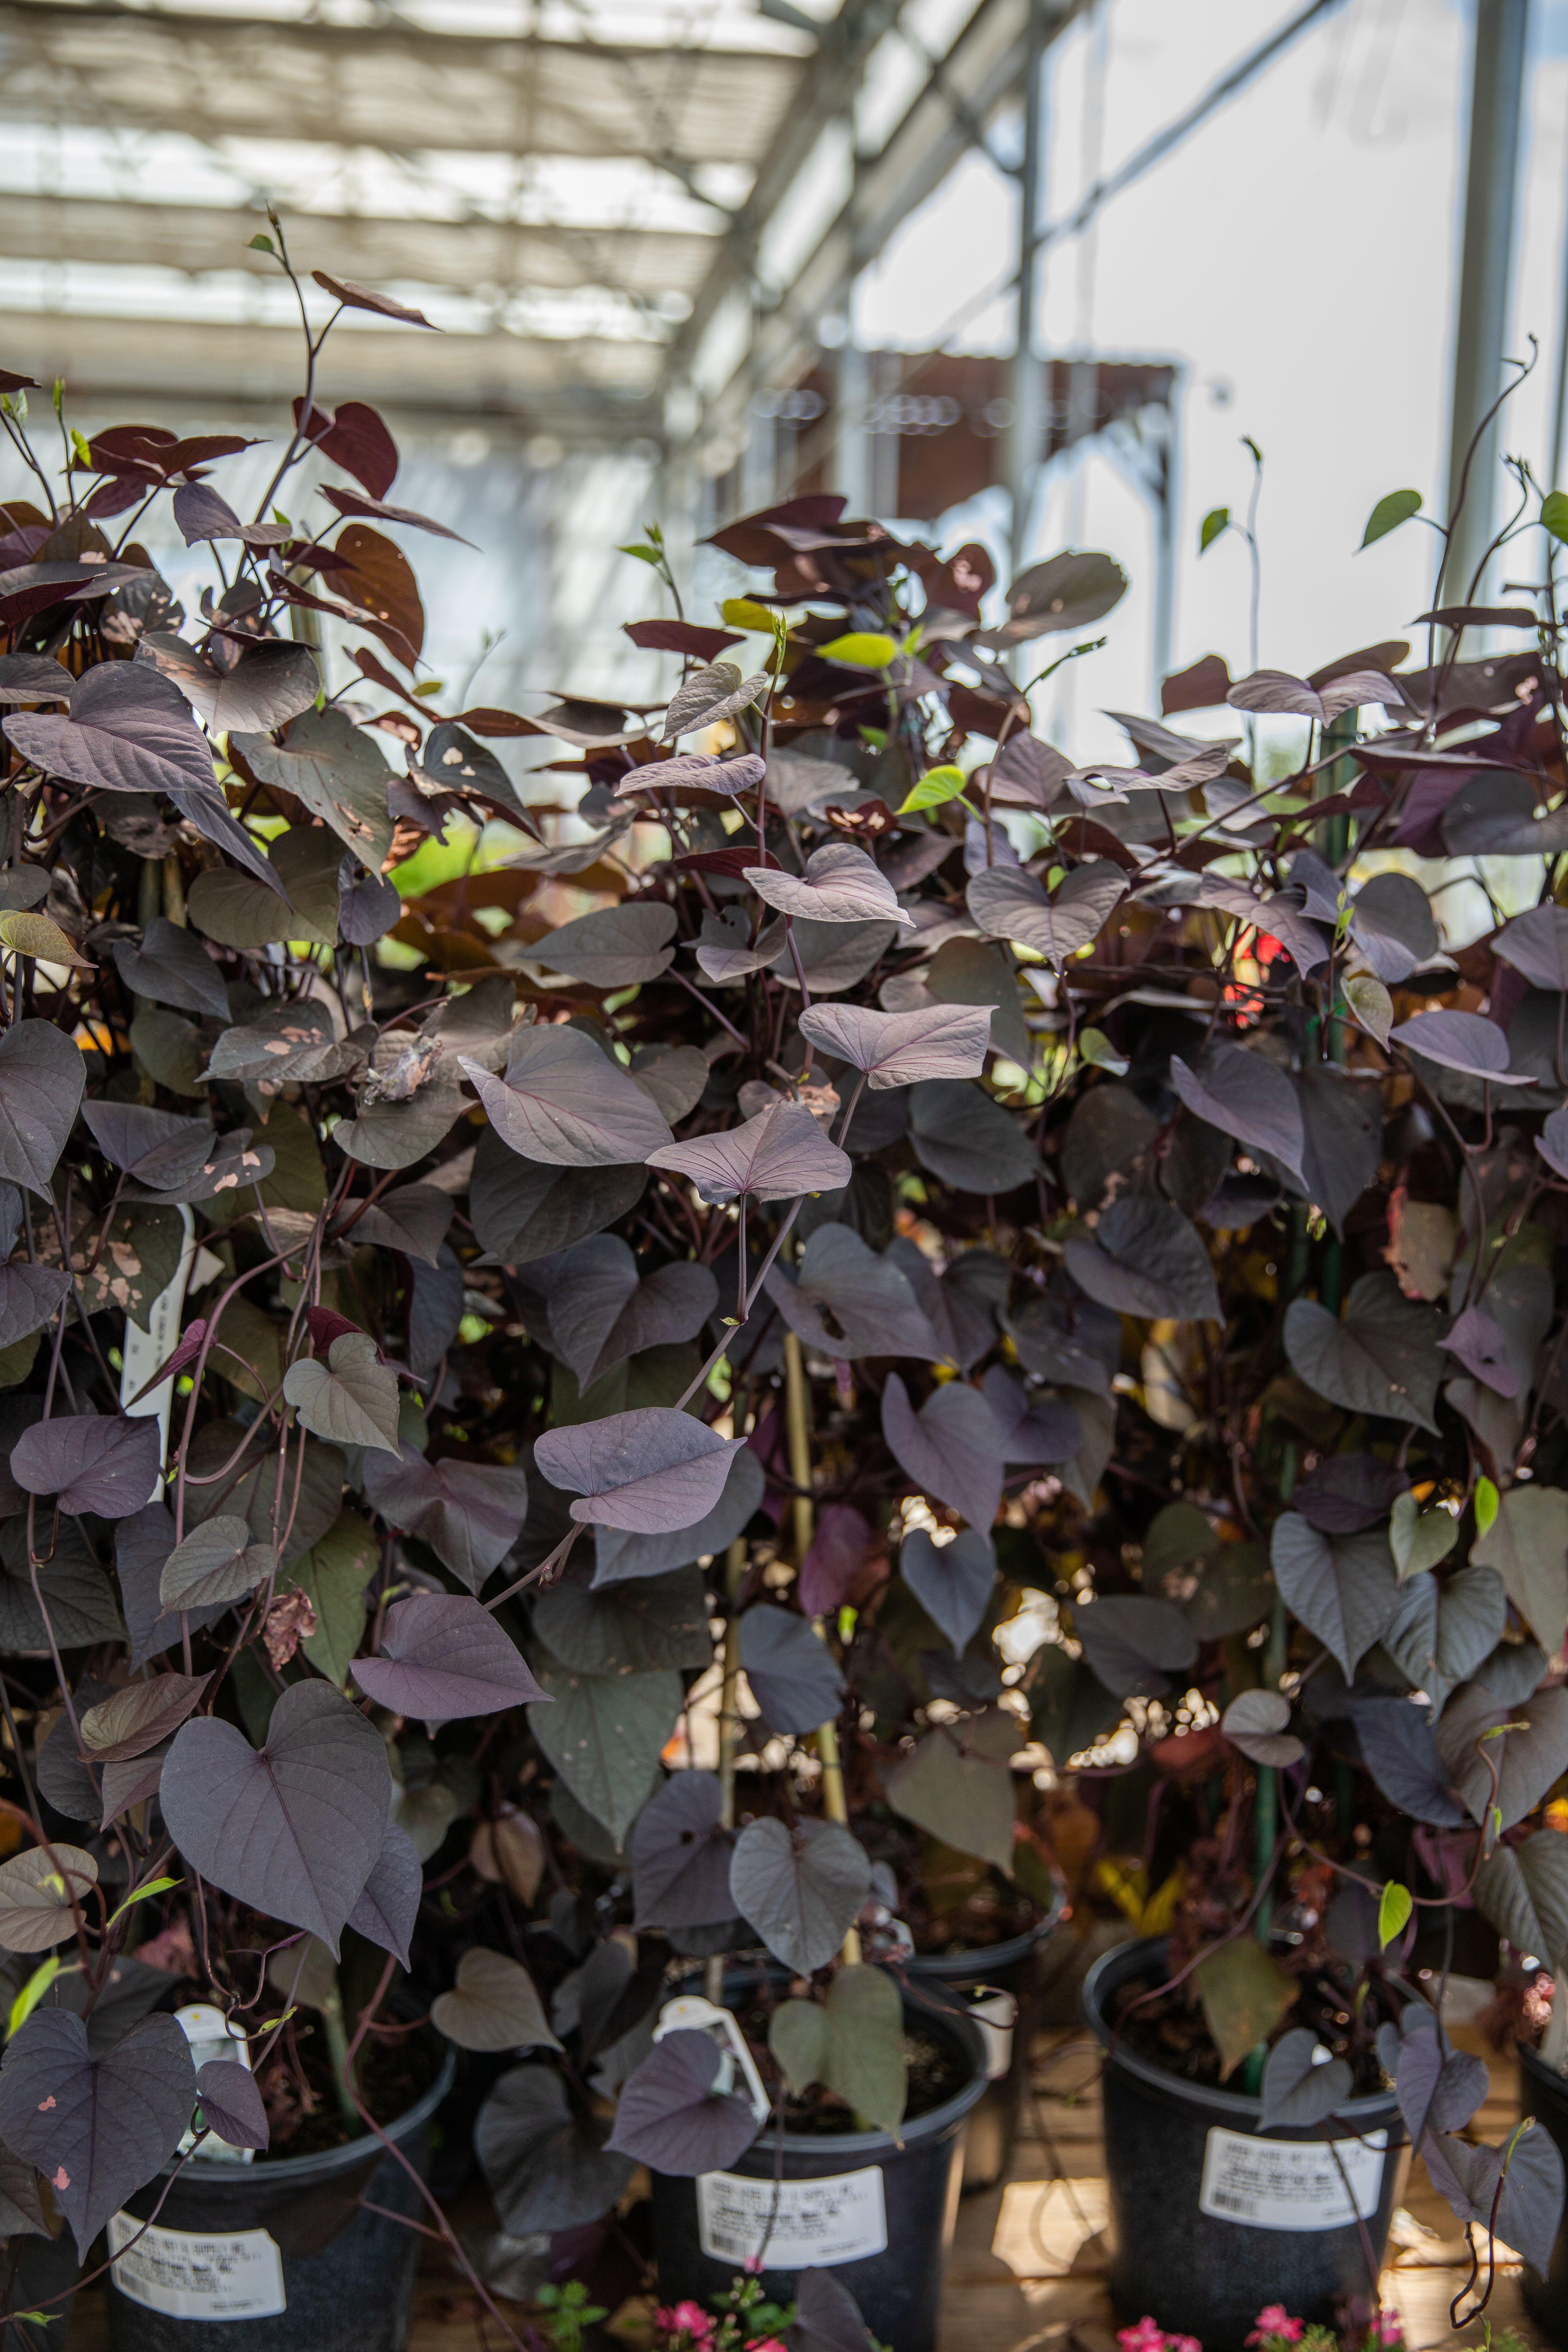 Sweet Potato Vine Fall Plants Potato Vines Light Purple Flowers